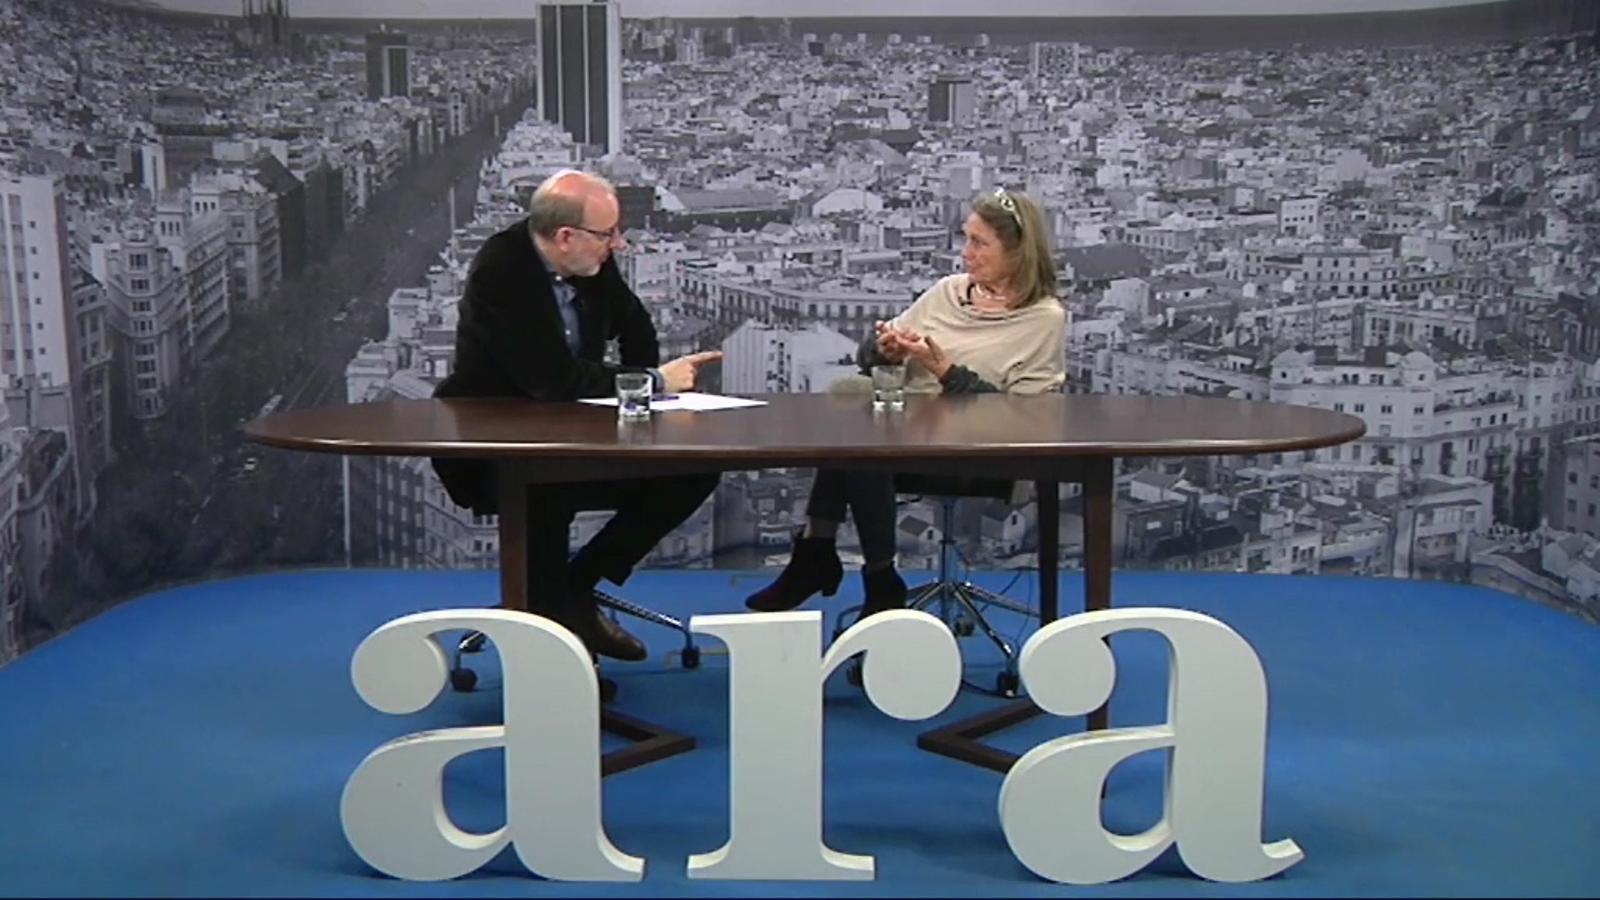 Entrevista d'Antoni Bassas a Beth Galí